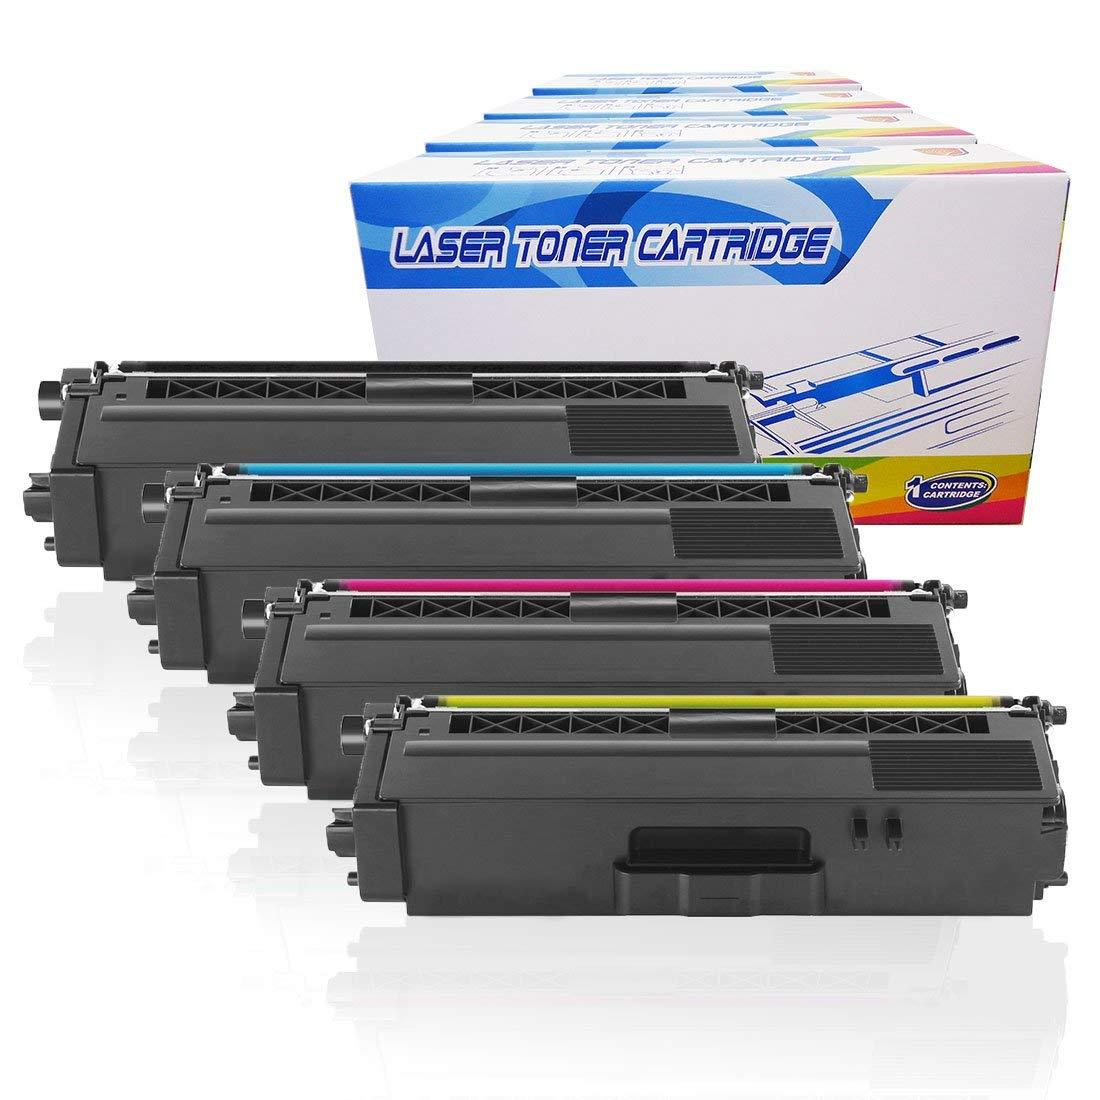 4 Pack Brother TN331 Toner Cartridge for MFC-L8600CDW MFC-L8850CDW Printers